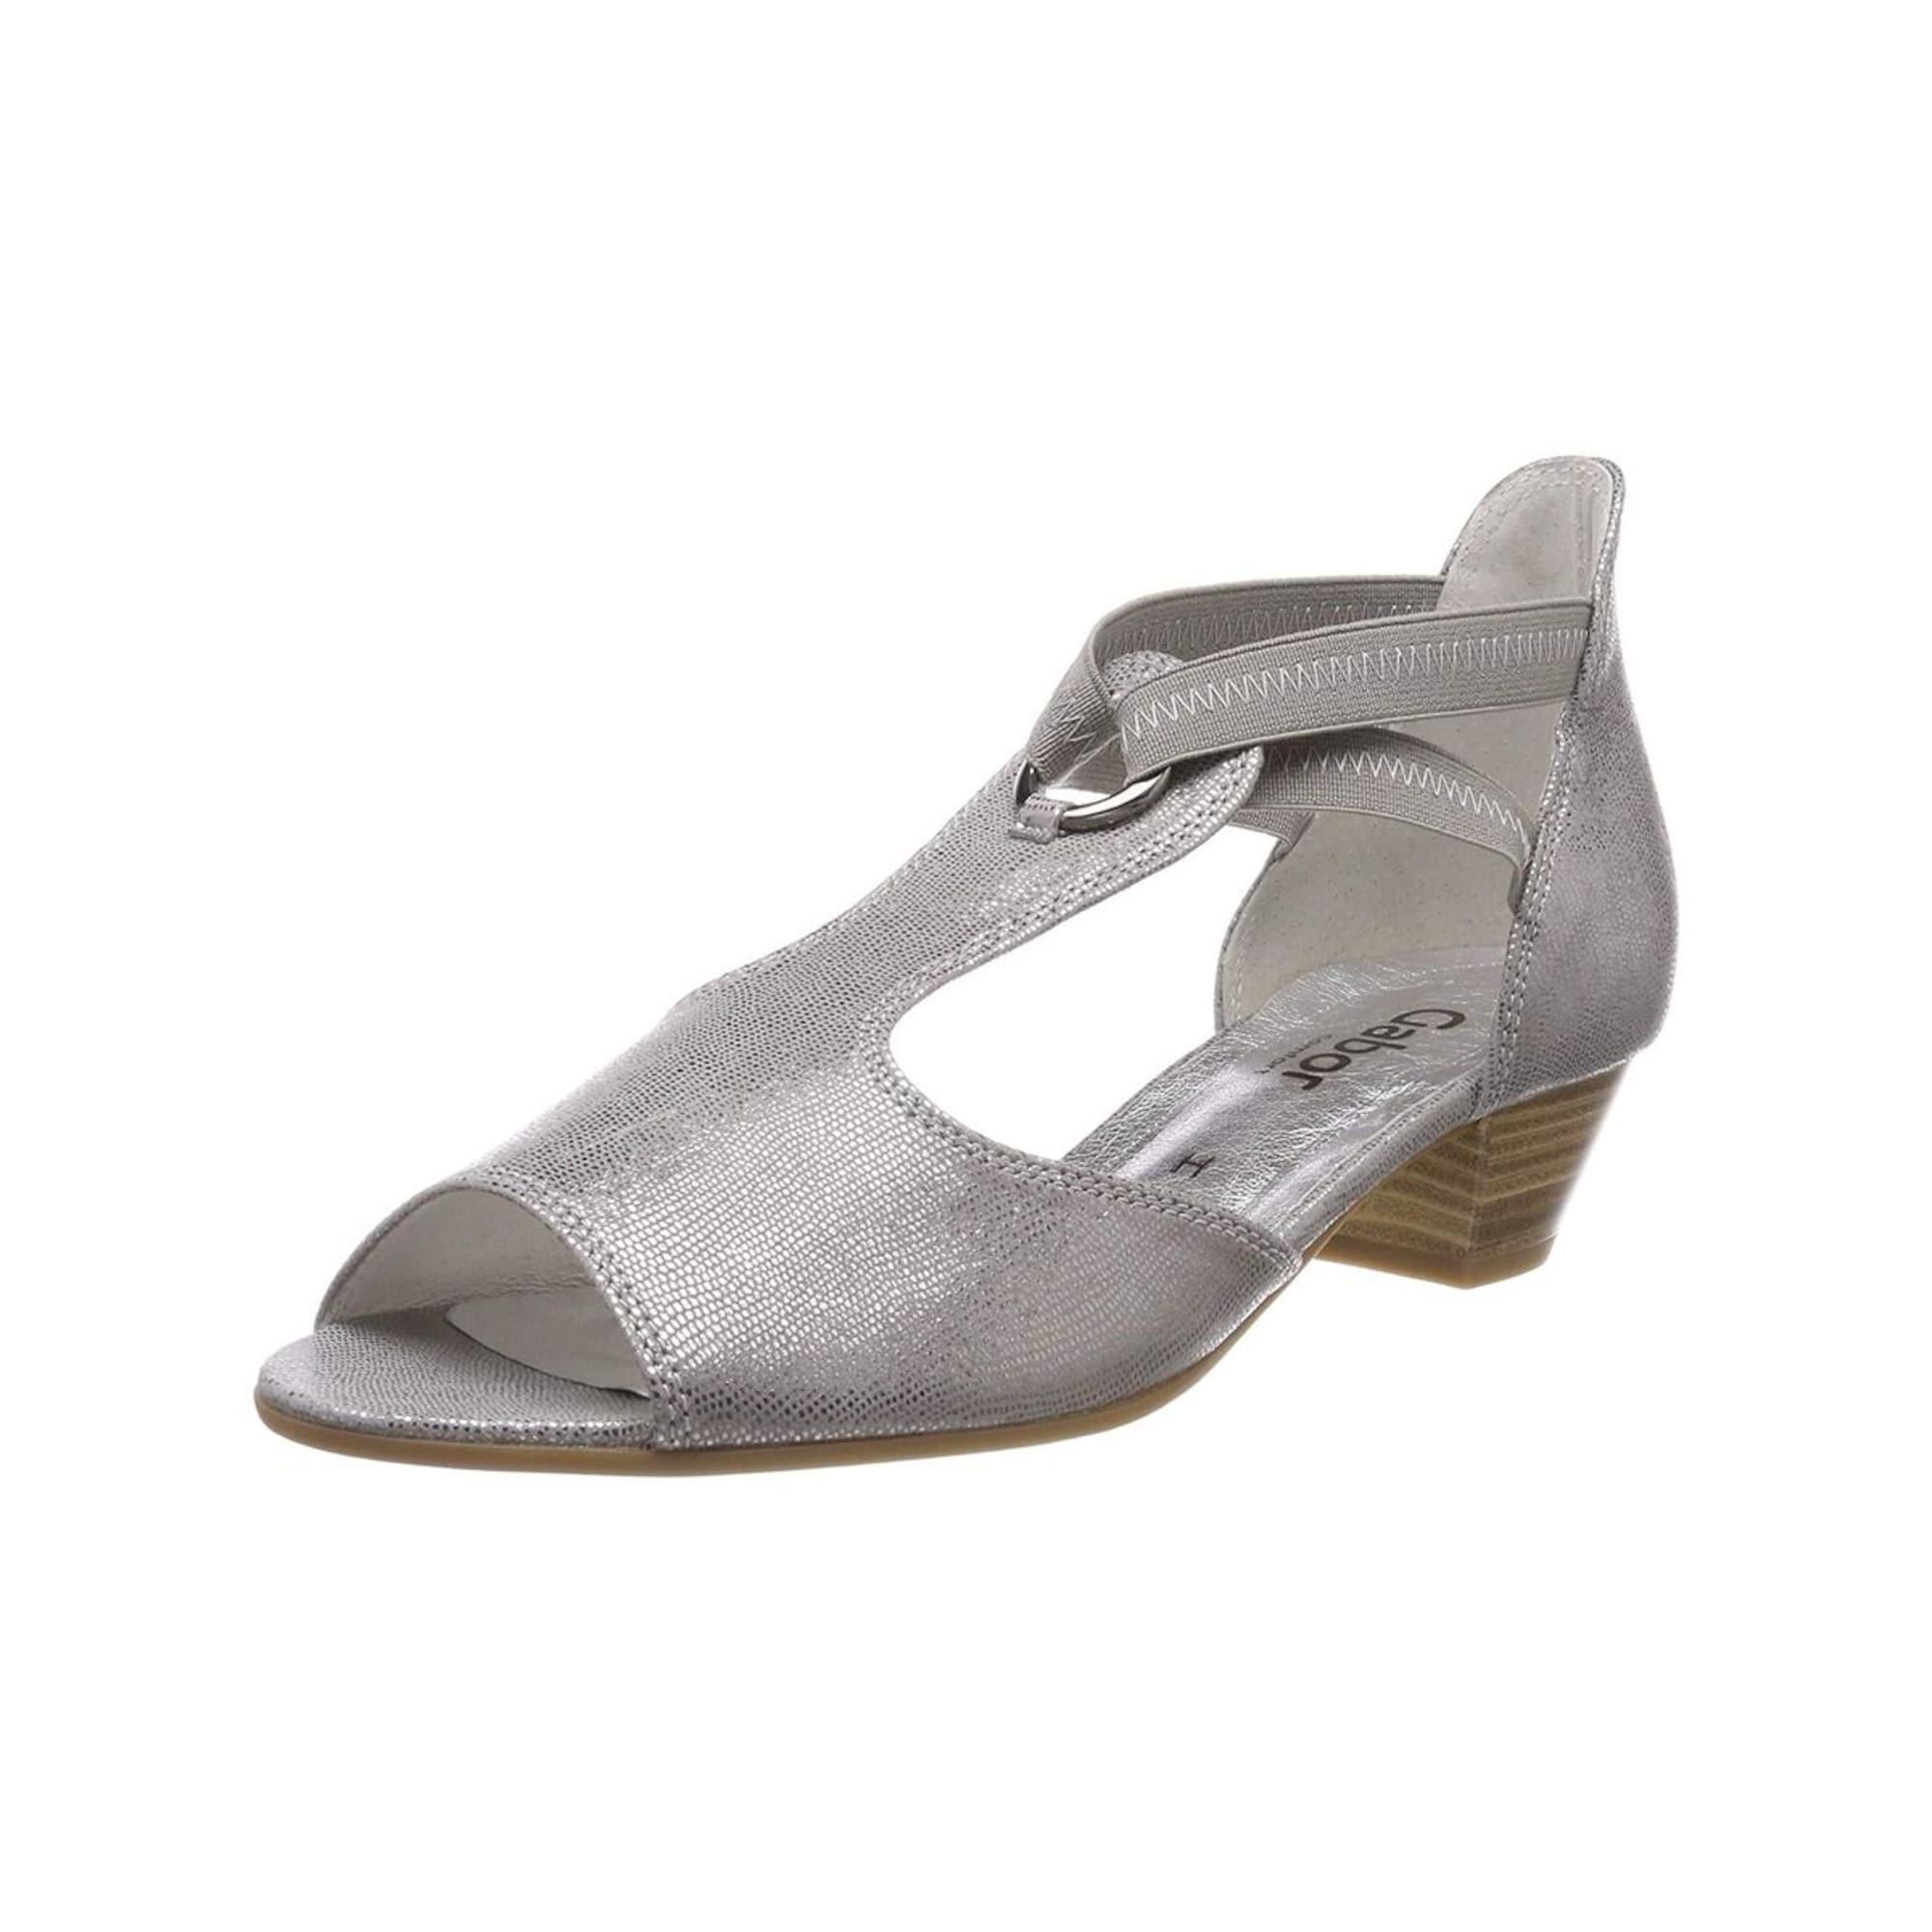 Damen Gabor Sandalen grau, weiß | 04058394220029